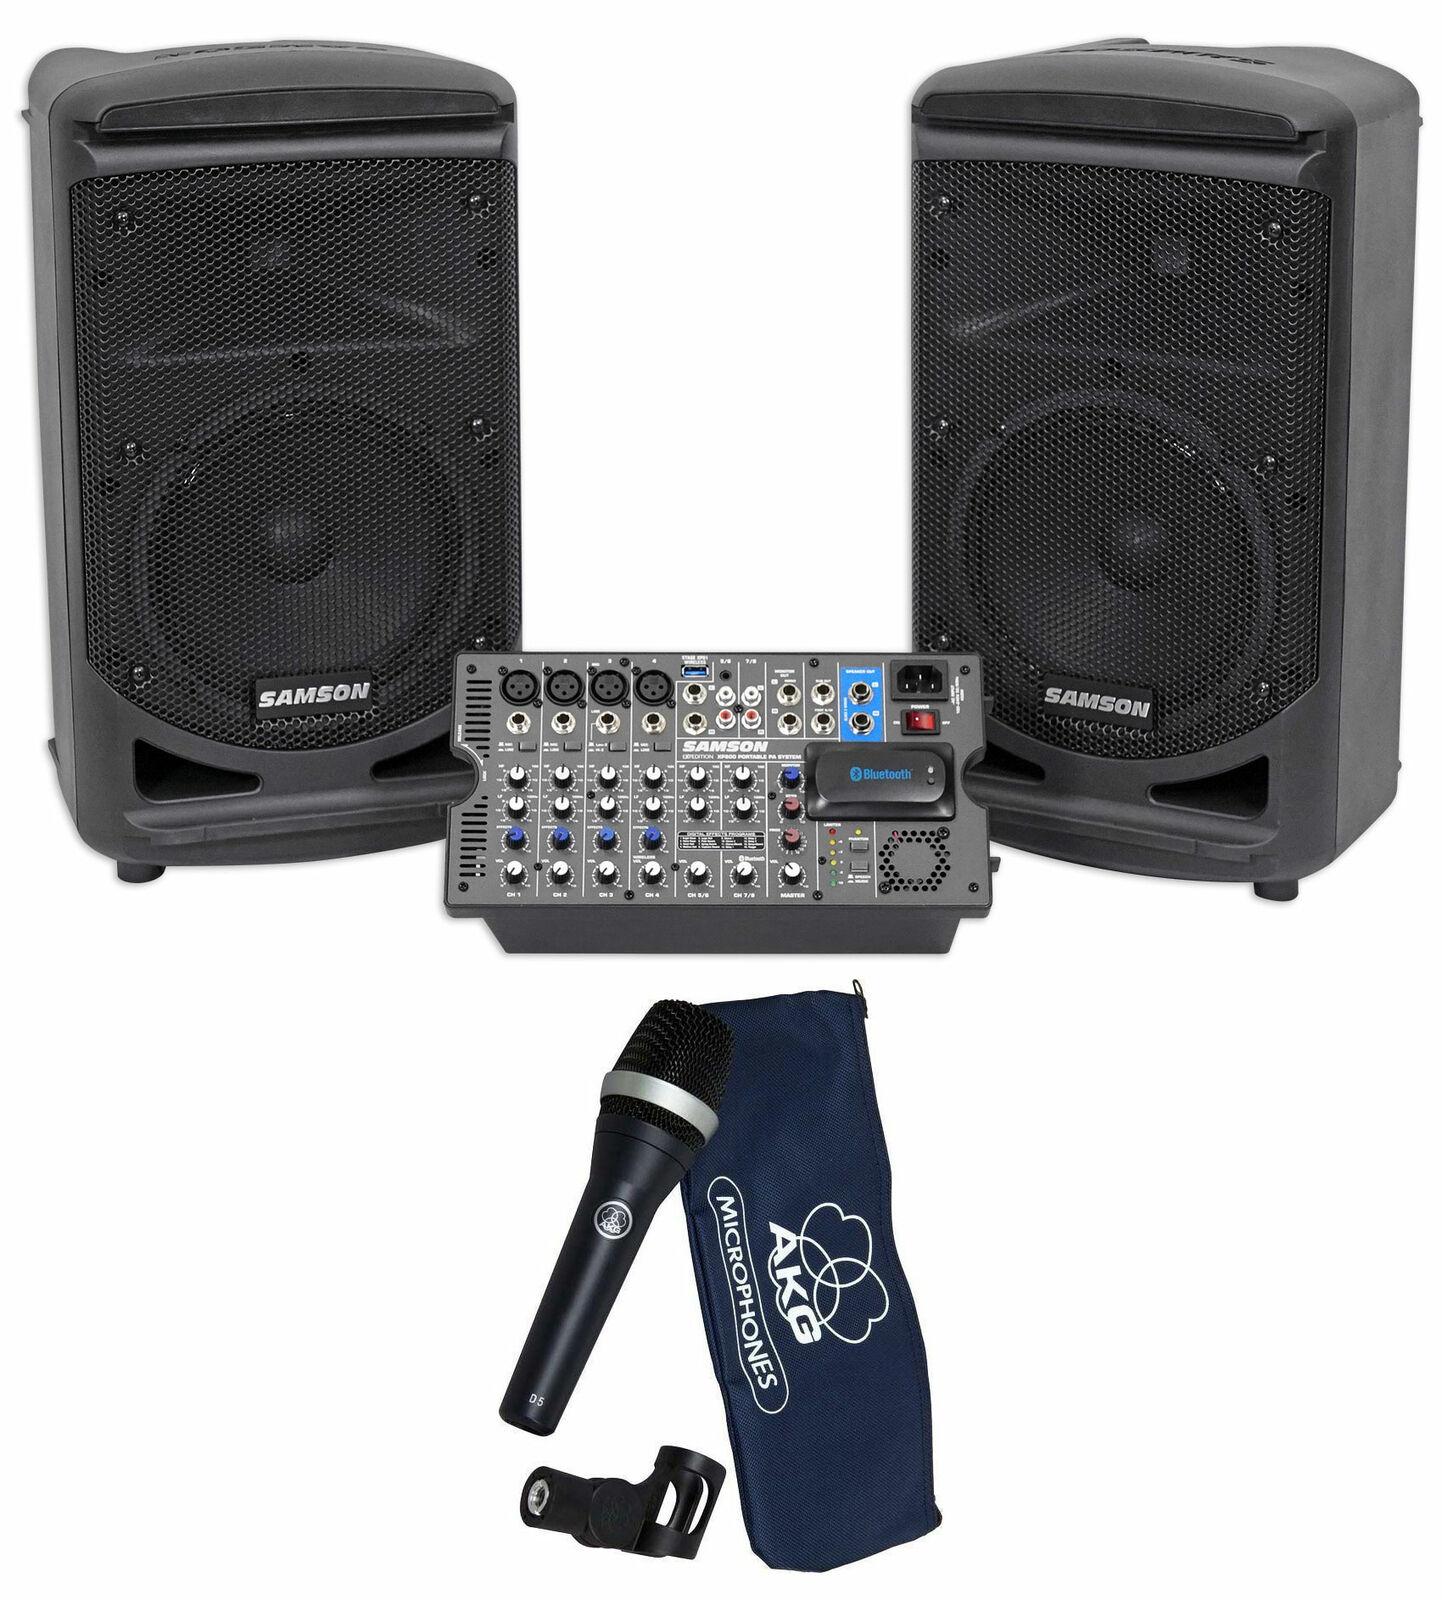 Samson Expedition XP800 8  Portable PA DJ Speaker System+Powerot Mixer+AKG Mic